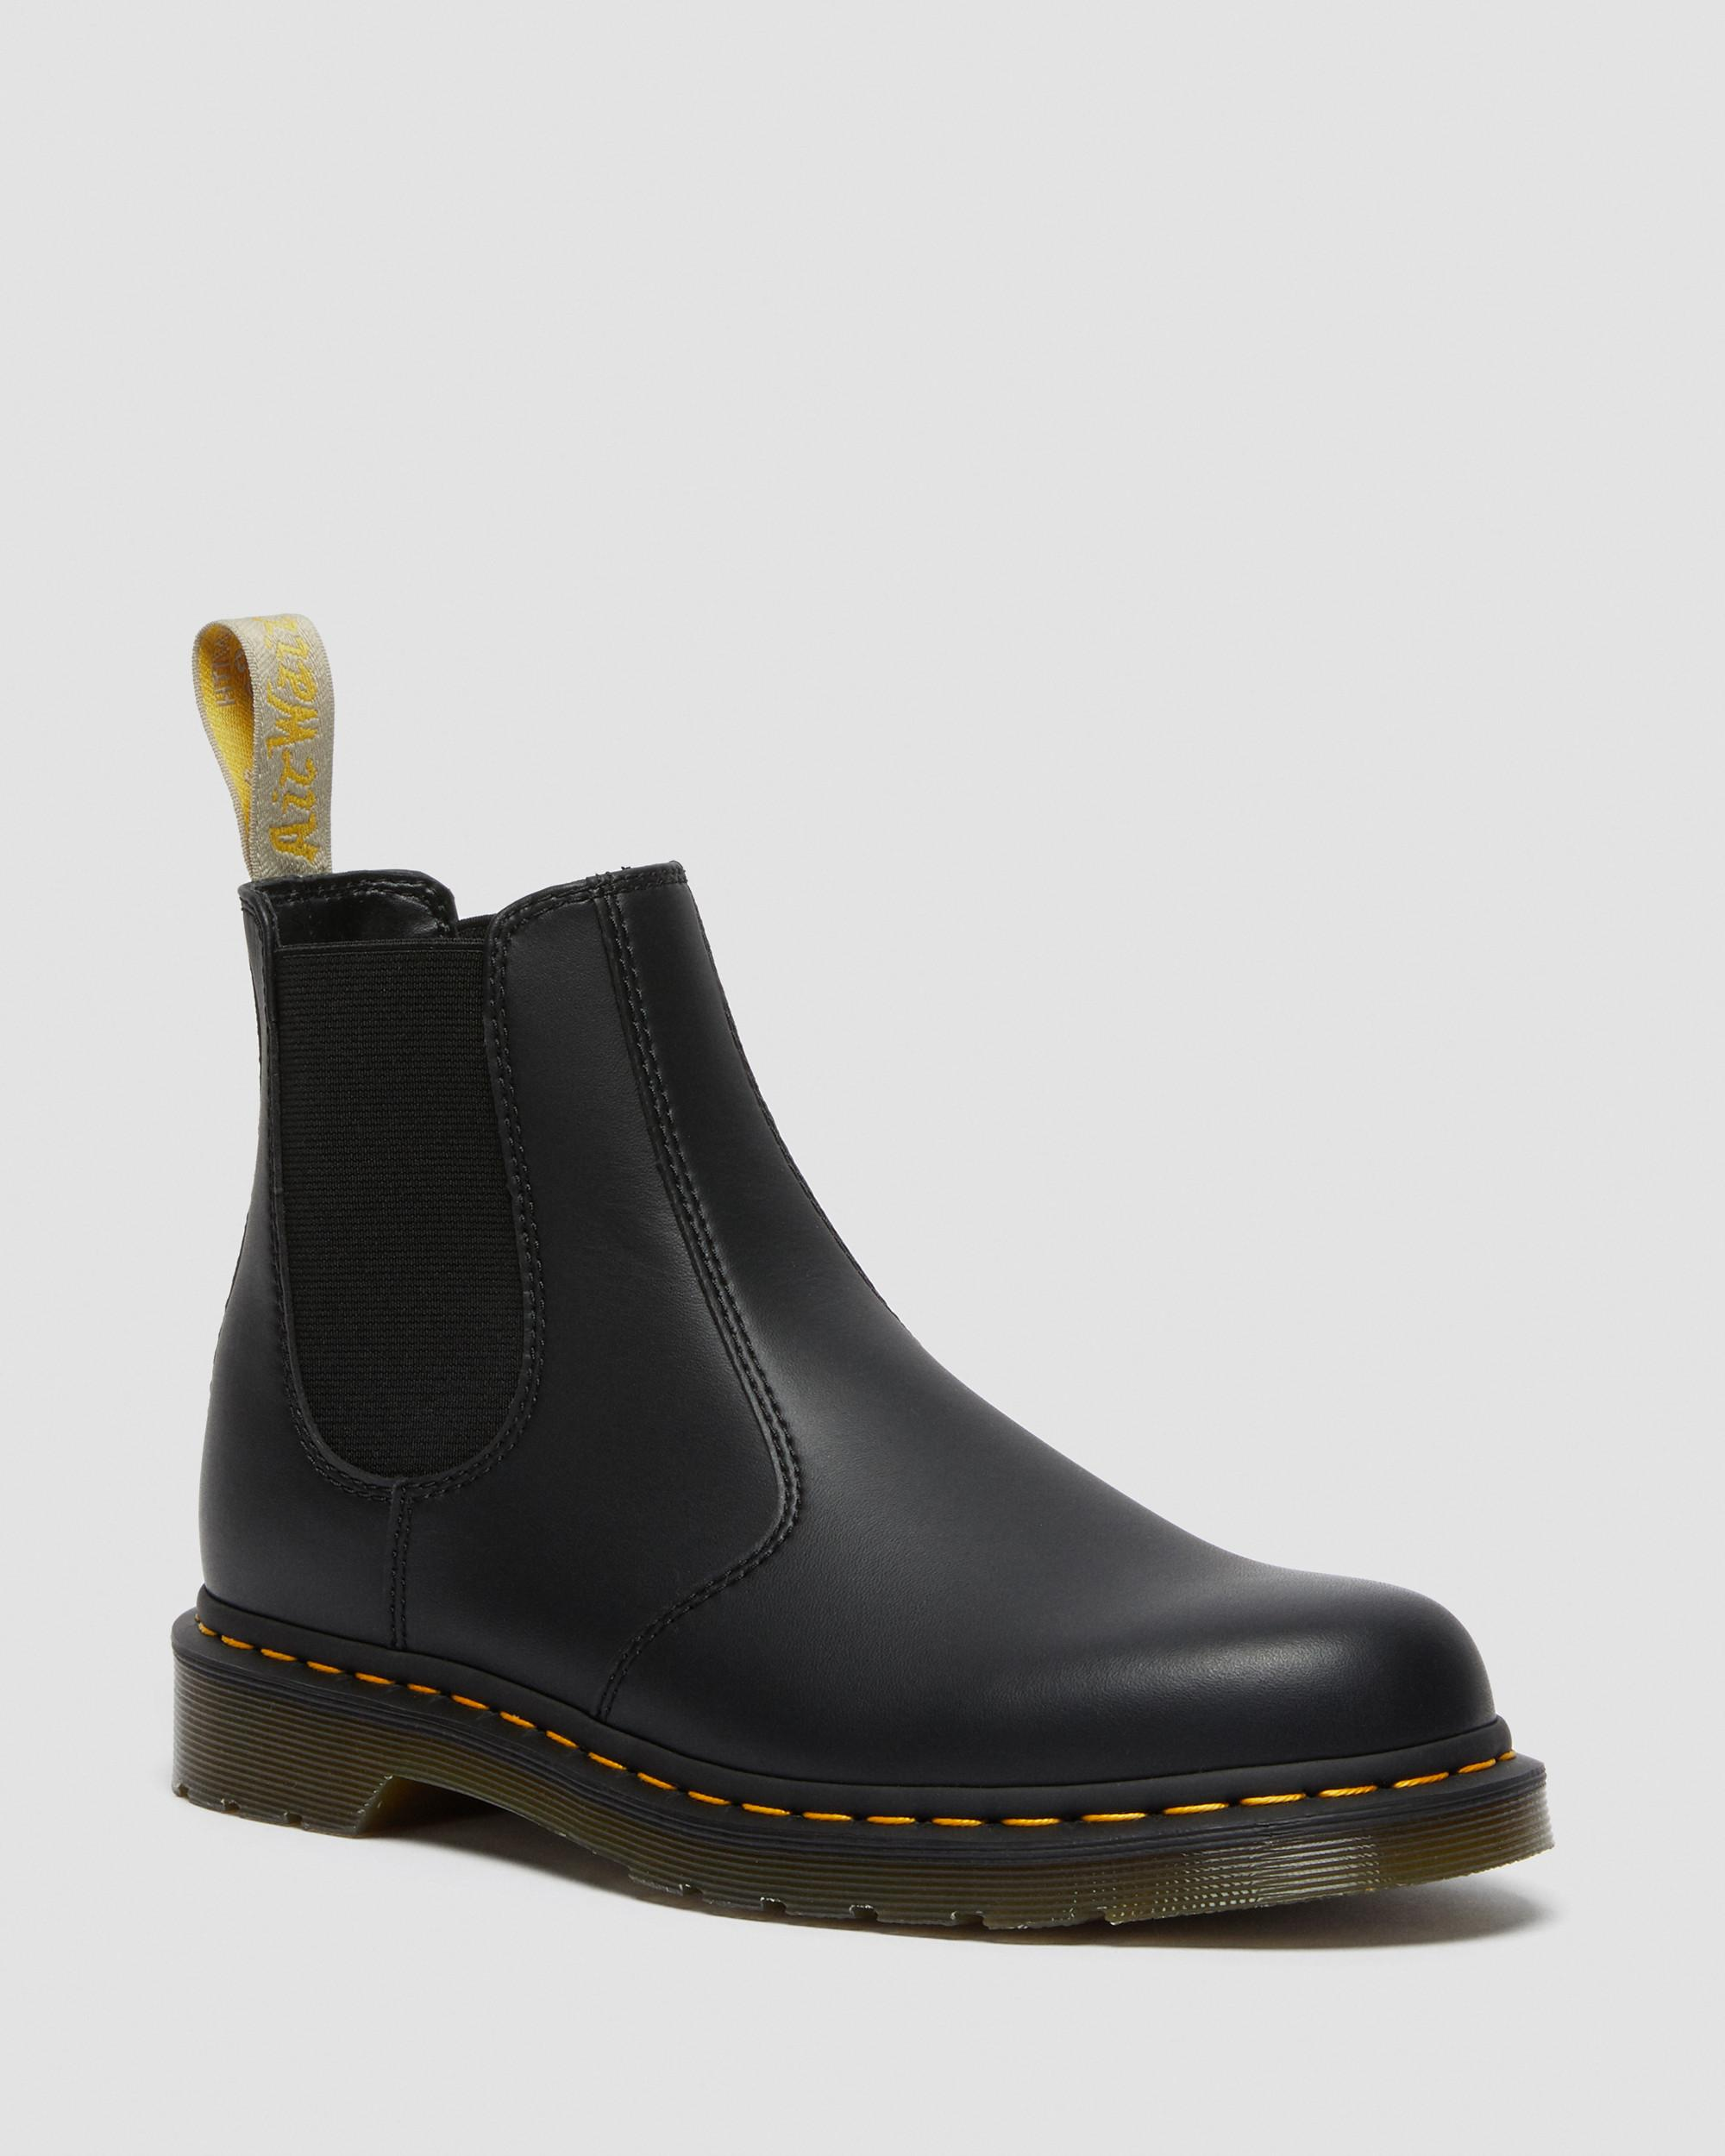 boots DR 2976 vegan MARTENS Chelsea 2bW9IEeDHY